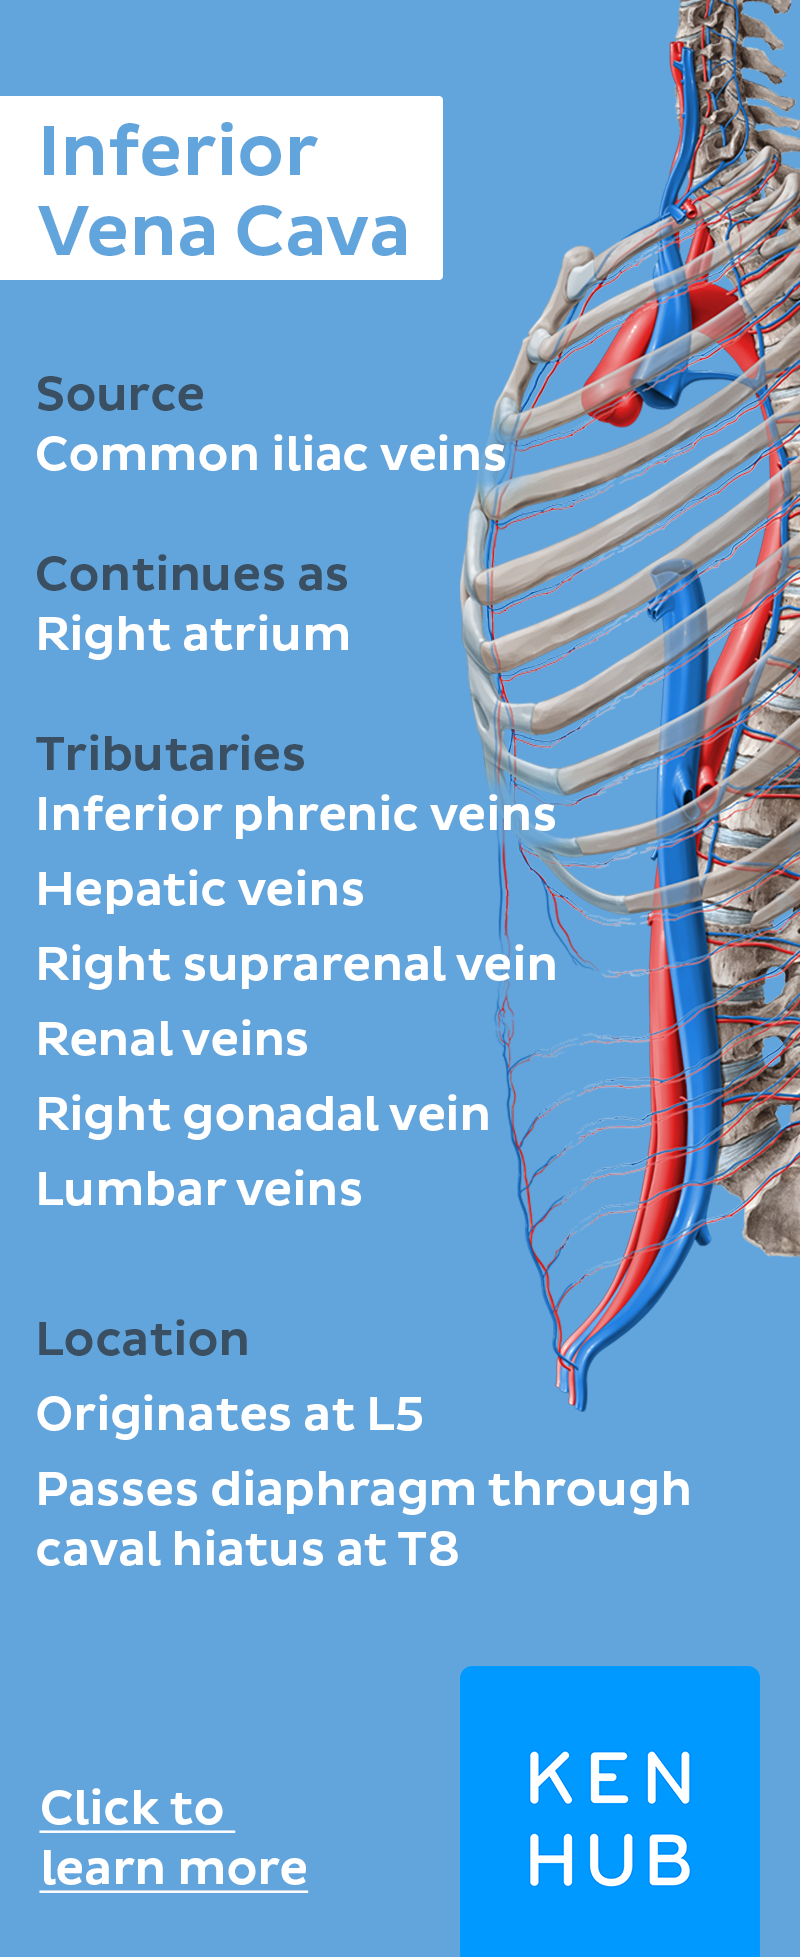 Inferior Vena Cava Anatomy Medical And Medicine